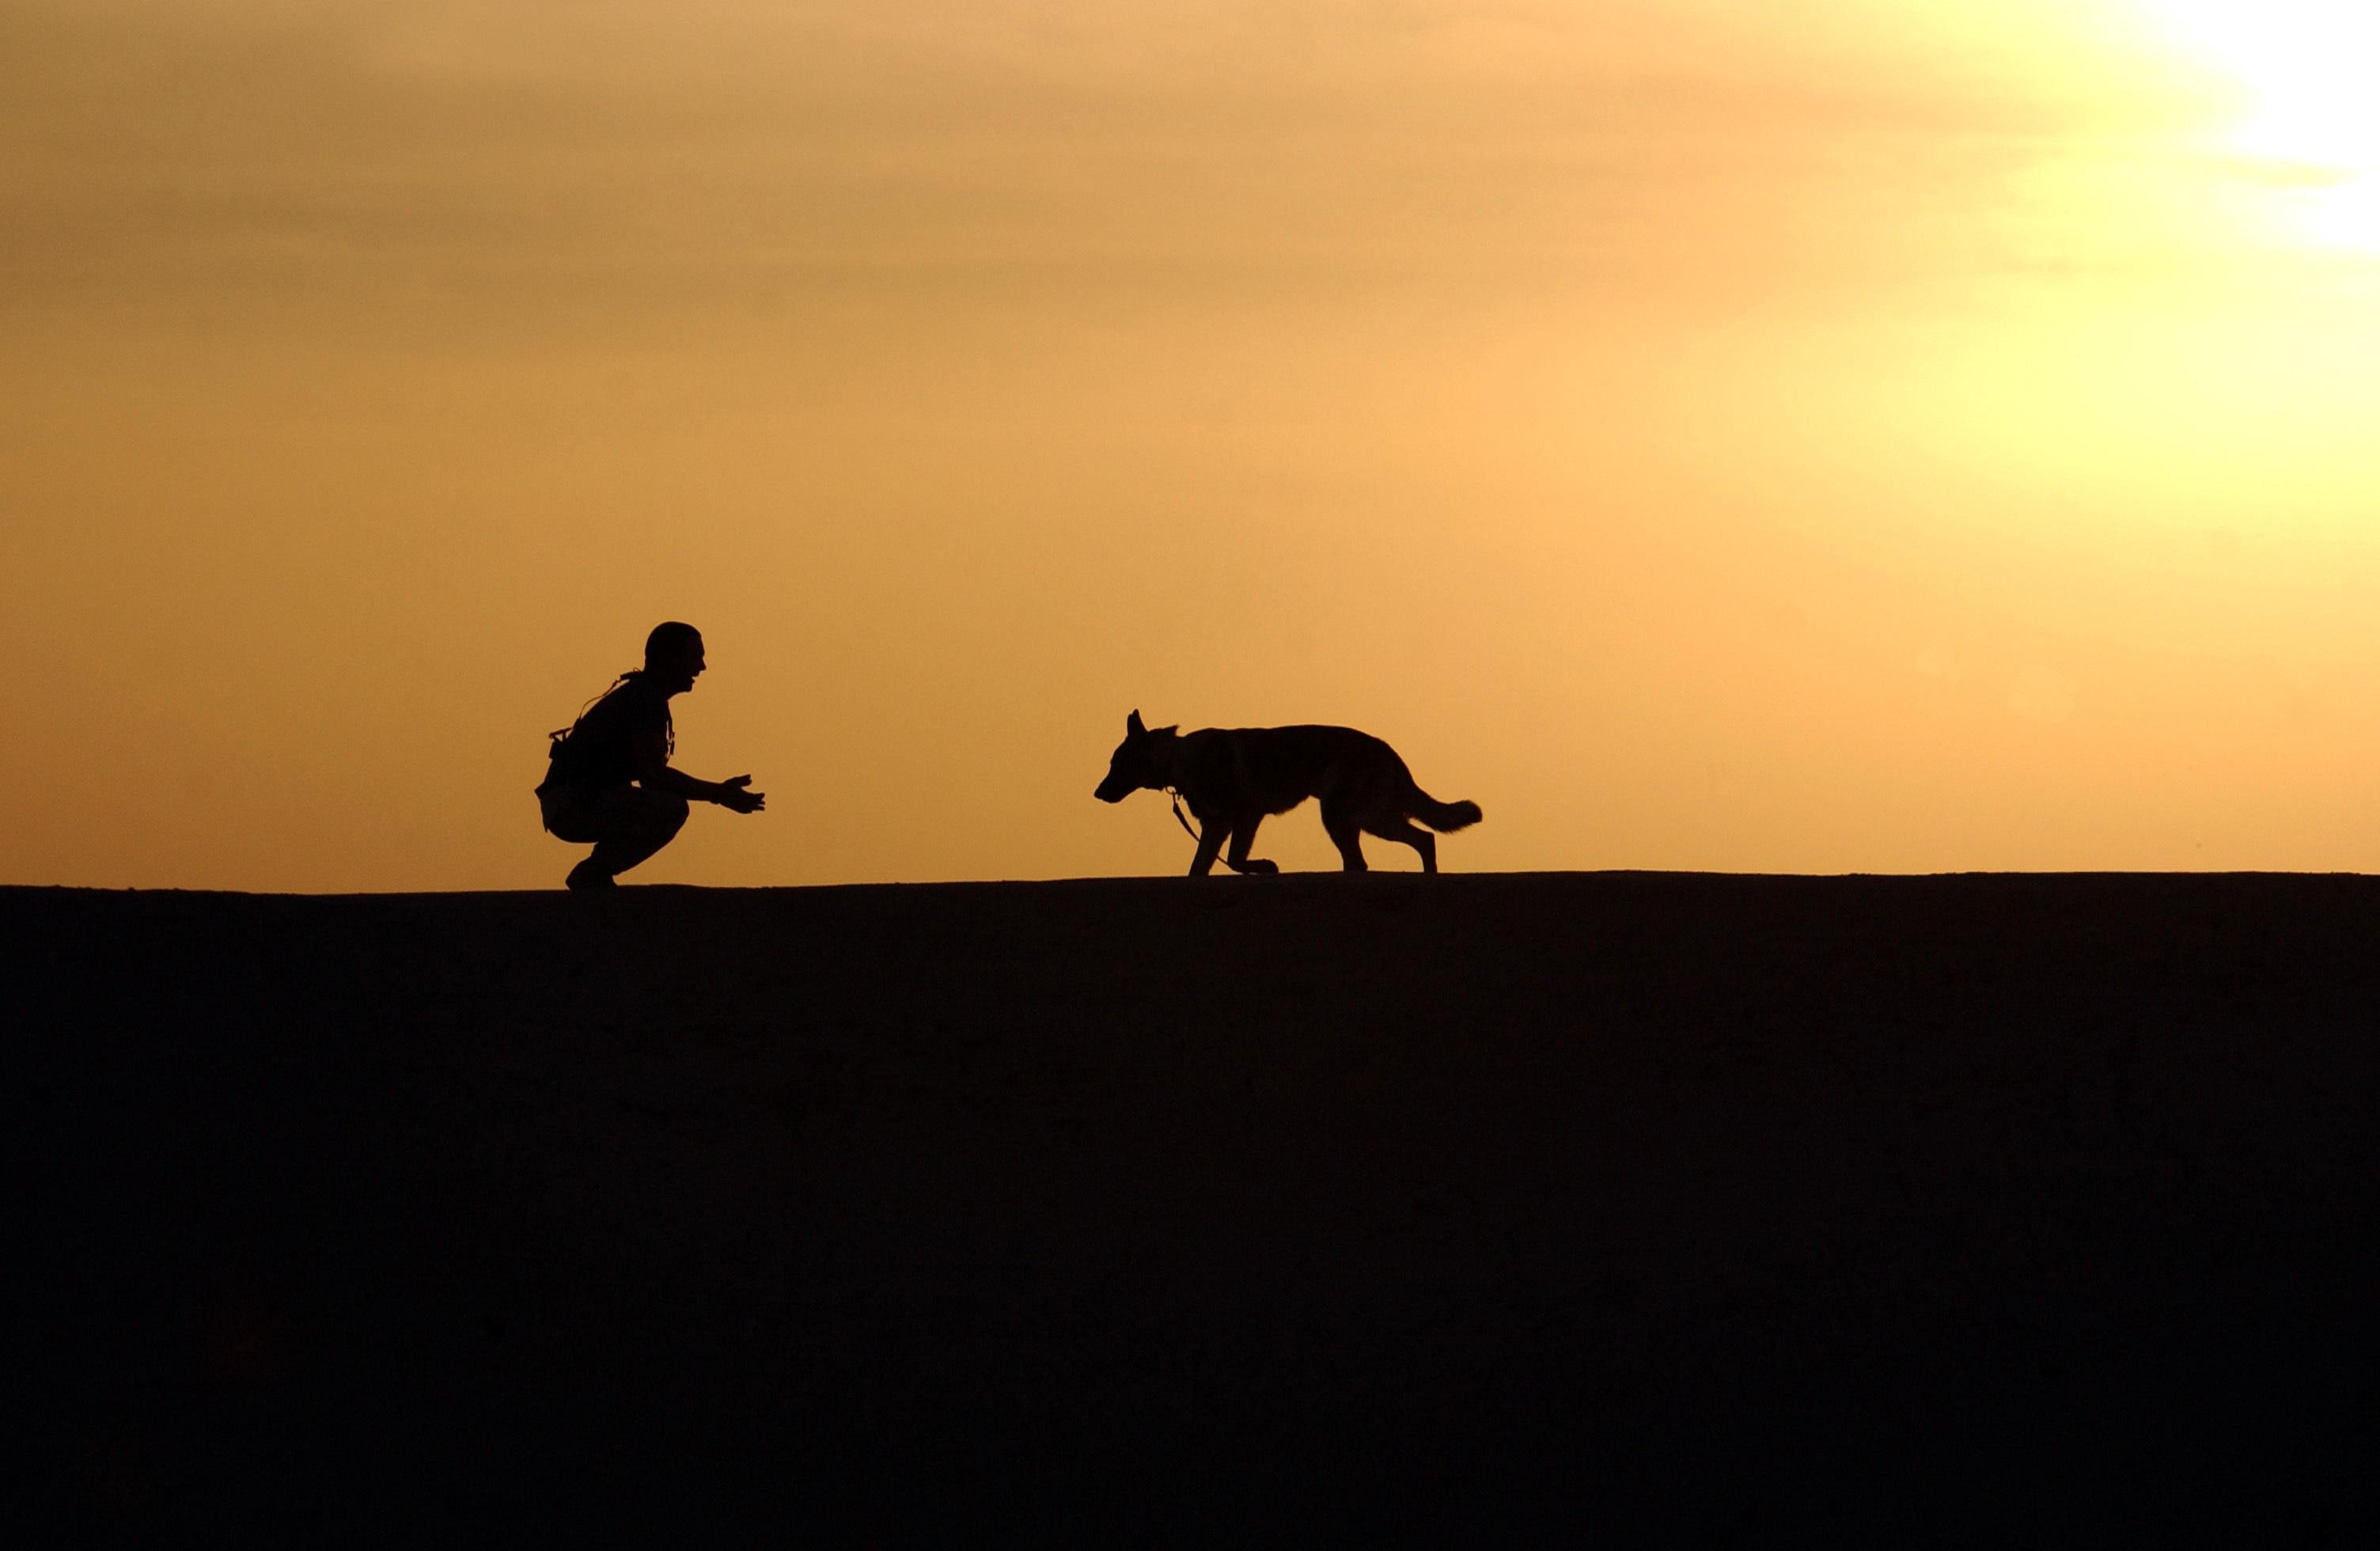 dog-trainer-silhouettes-sunset-38284.jpeg